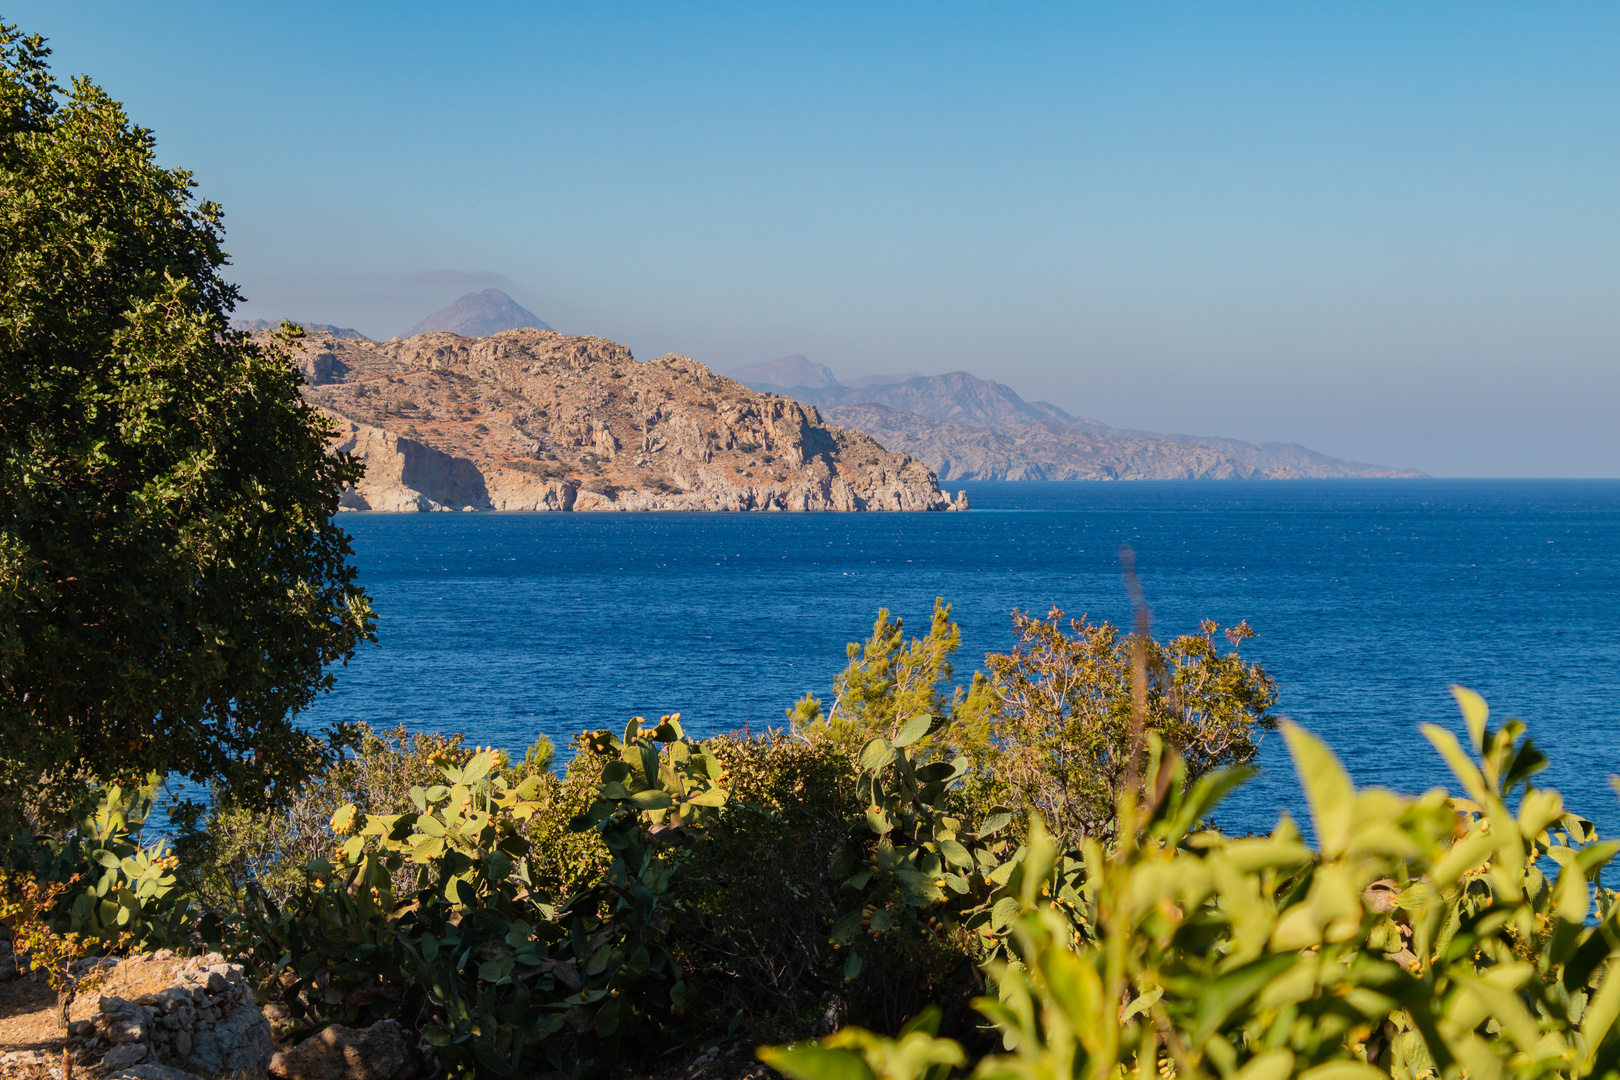 Küste in der Nähe des Apella Strandes